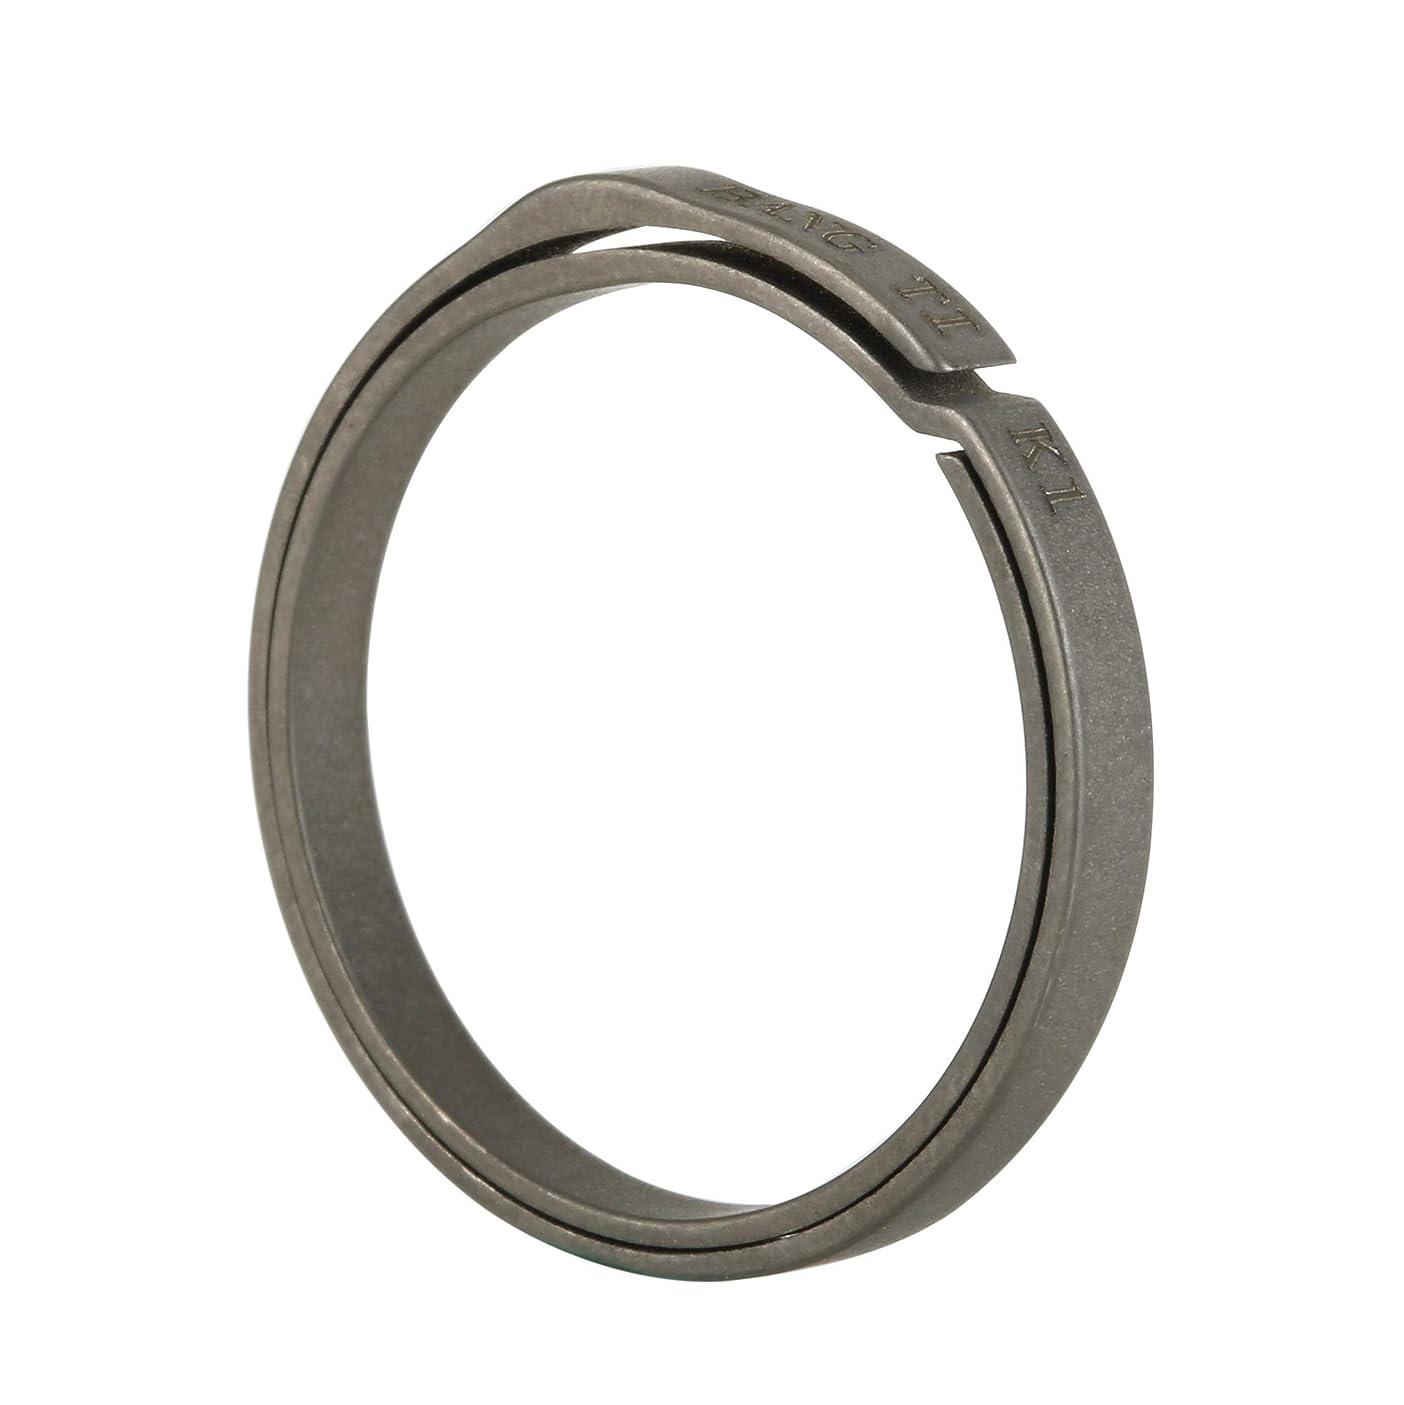 BANG TI Titanium Side-pushing Designed Key Rings (5-Pack, K1, K2) Save Your Nail, Group Your Keys, Lifetime Use ezmhauwuwtf581